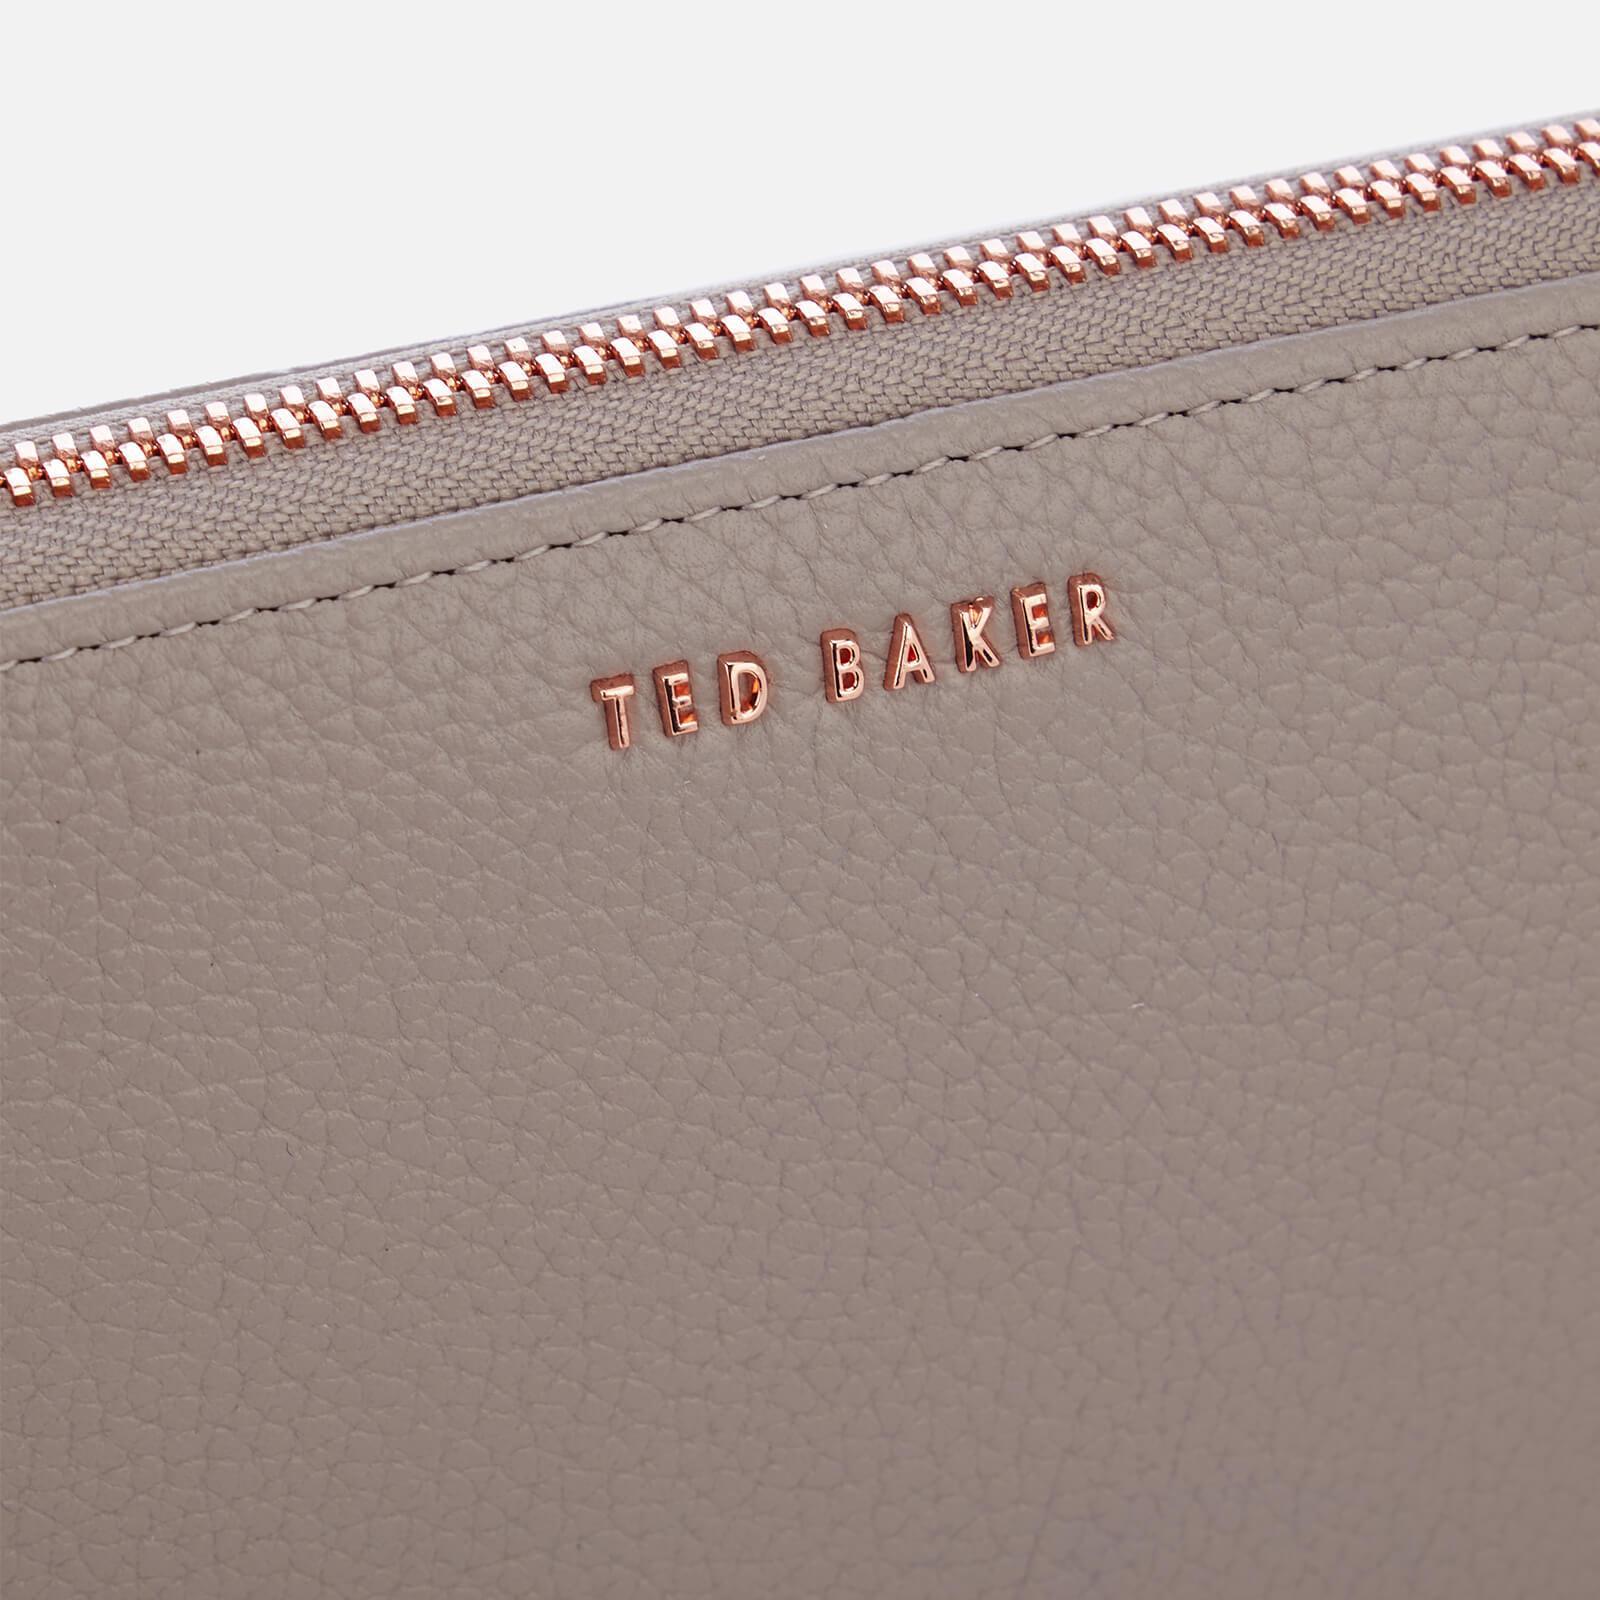 2e0bbe005 Ted Baker Sheea Tassel Zip Around Matinee Purse - Lyst